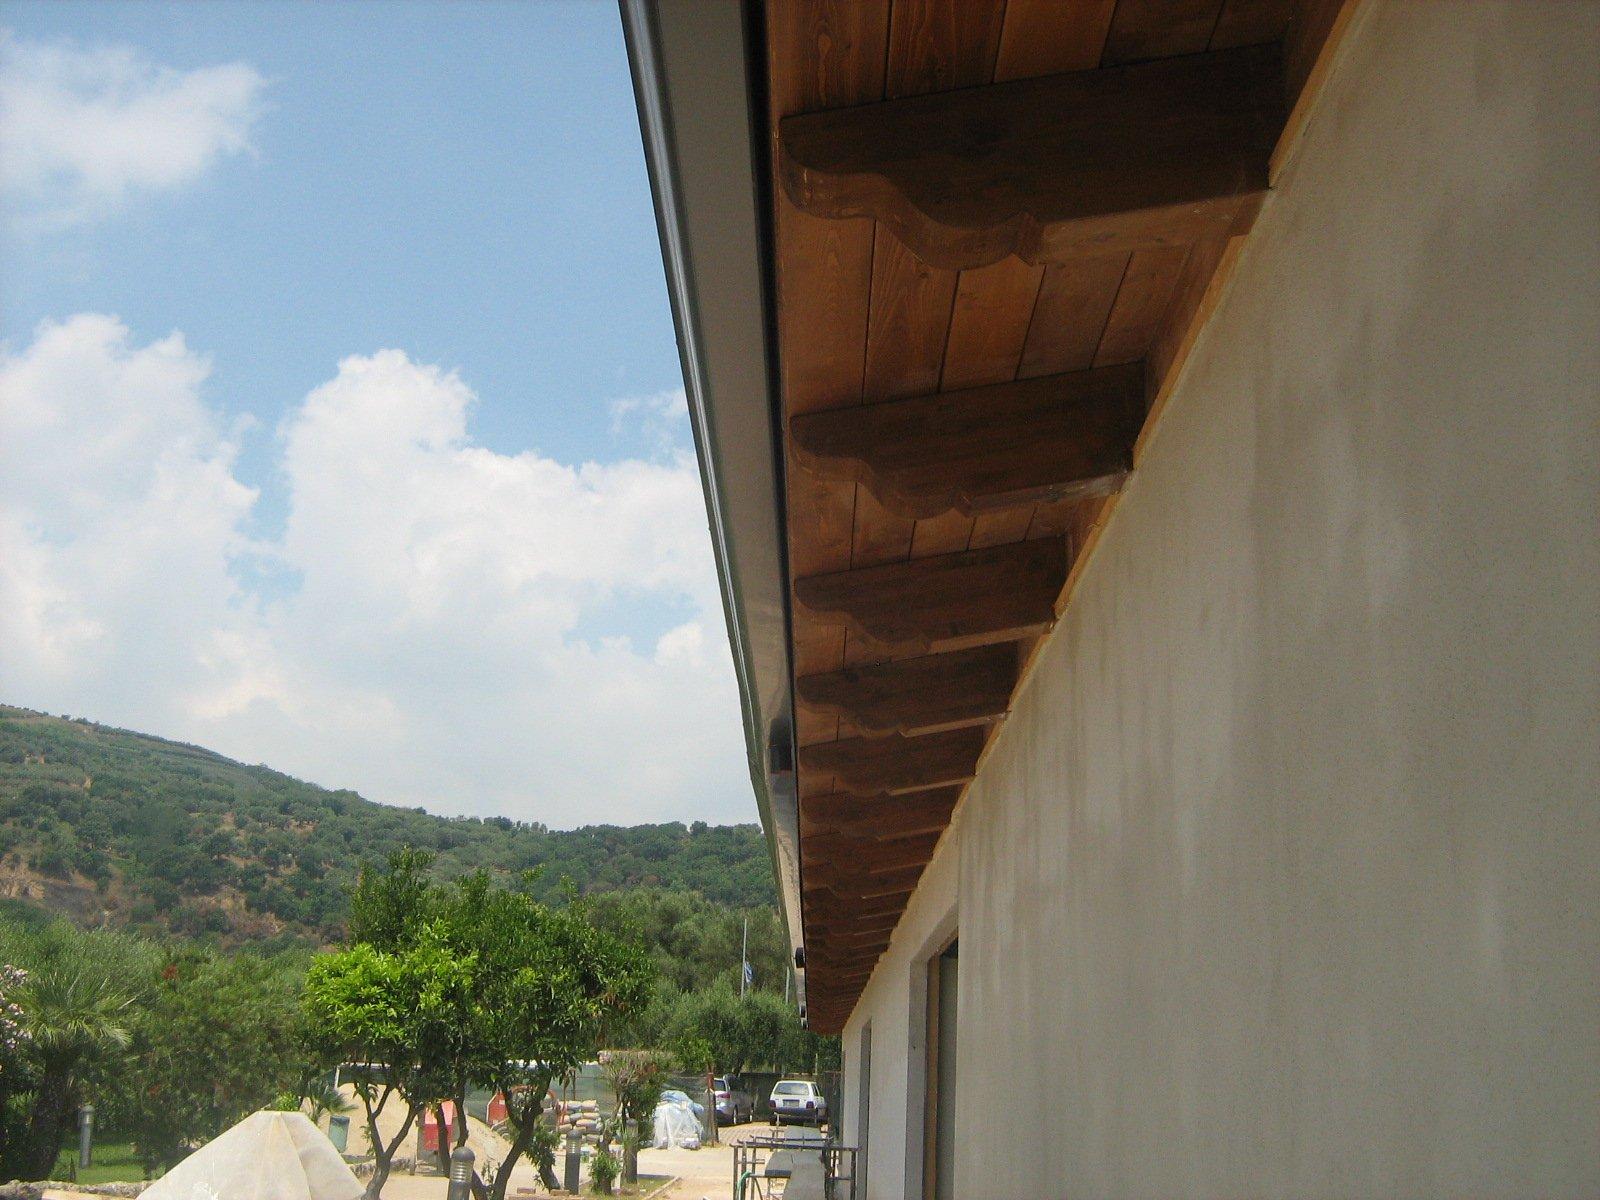 pannelli in legno sotto le grondaie